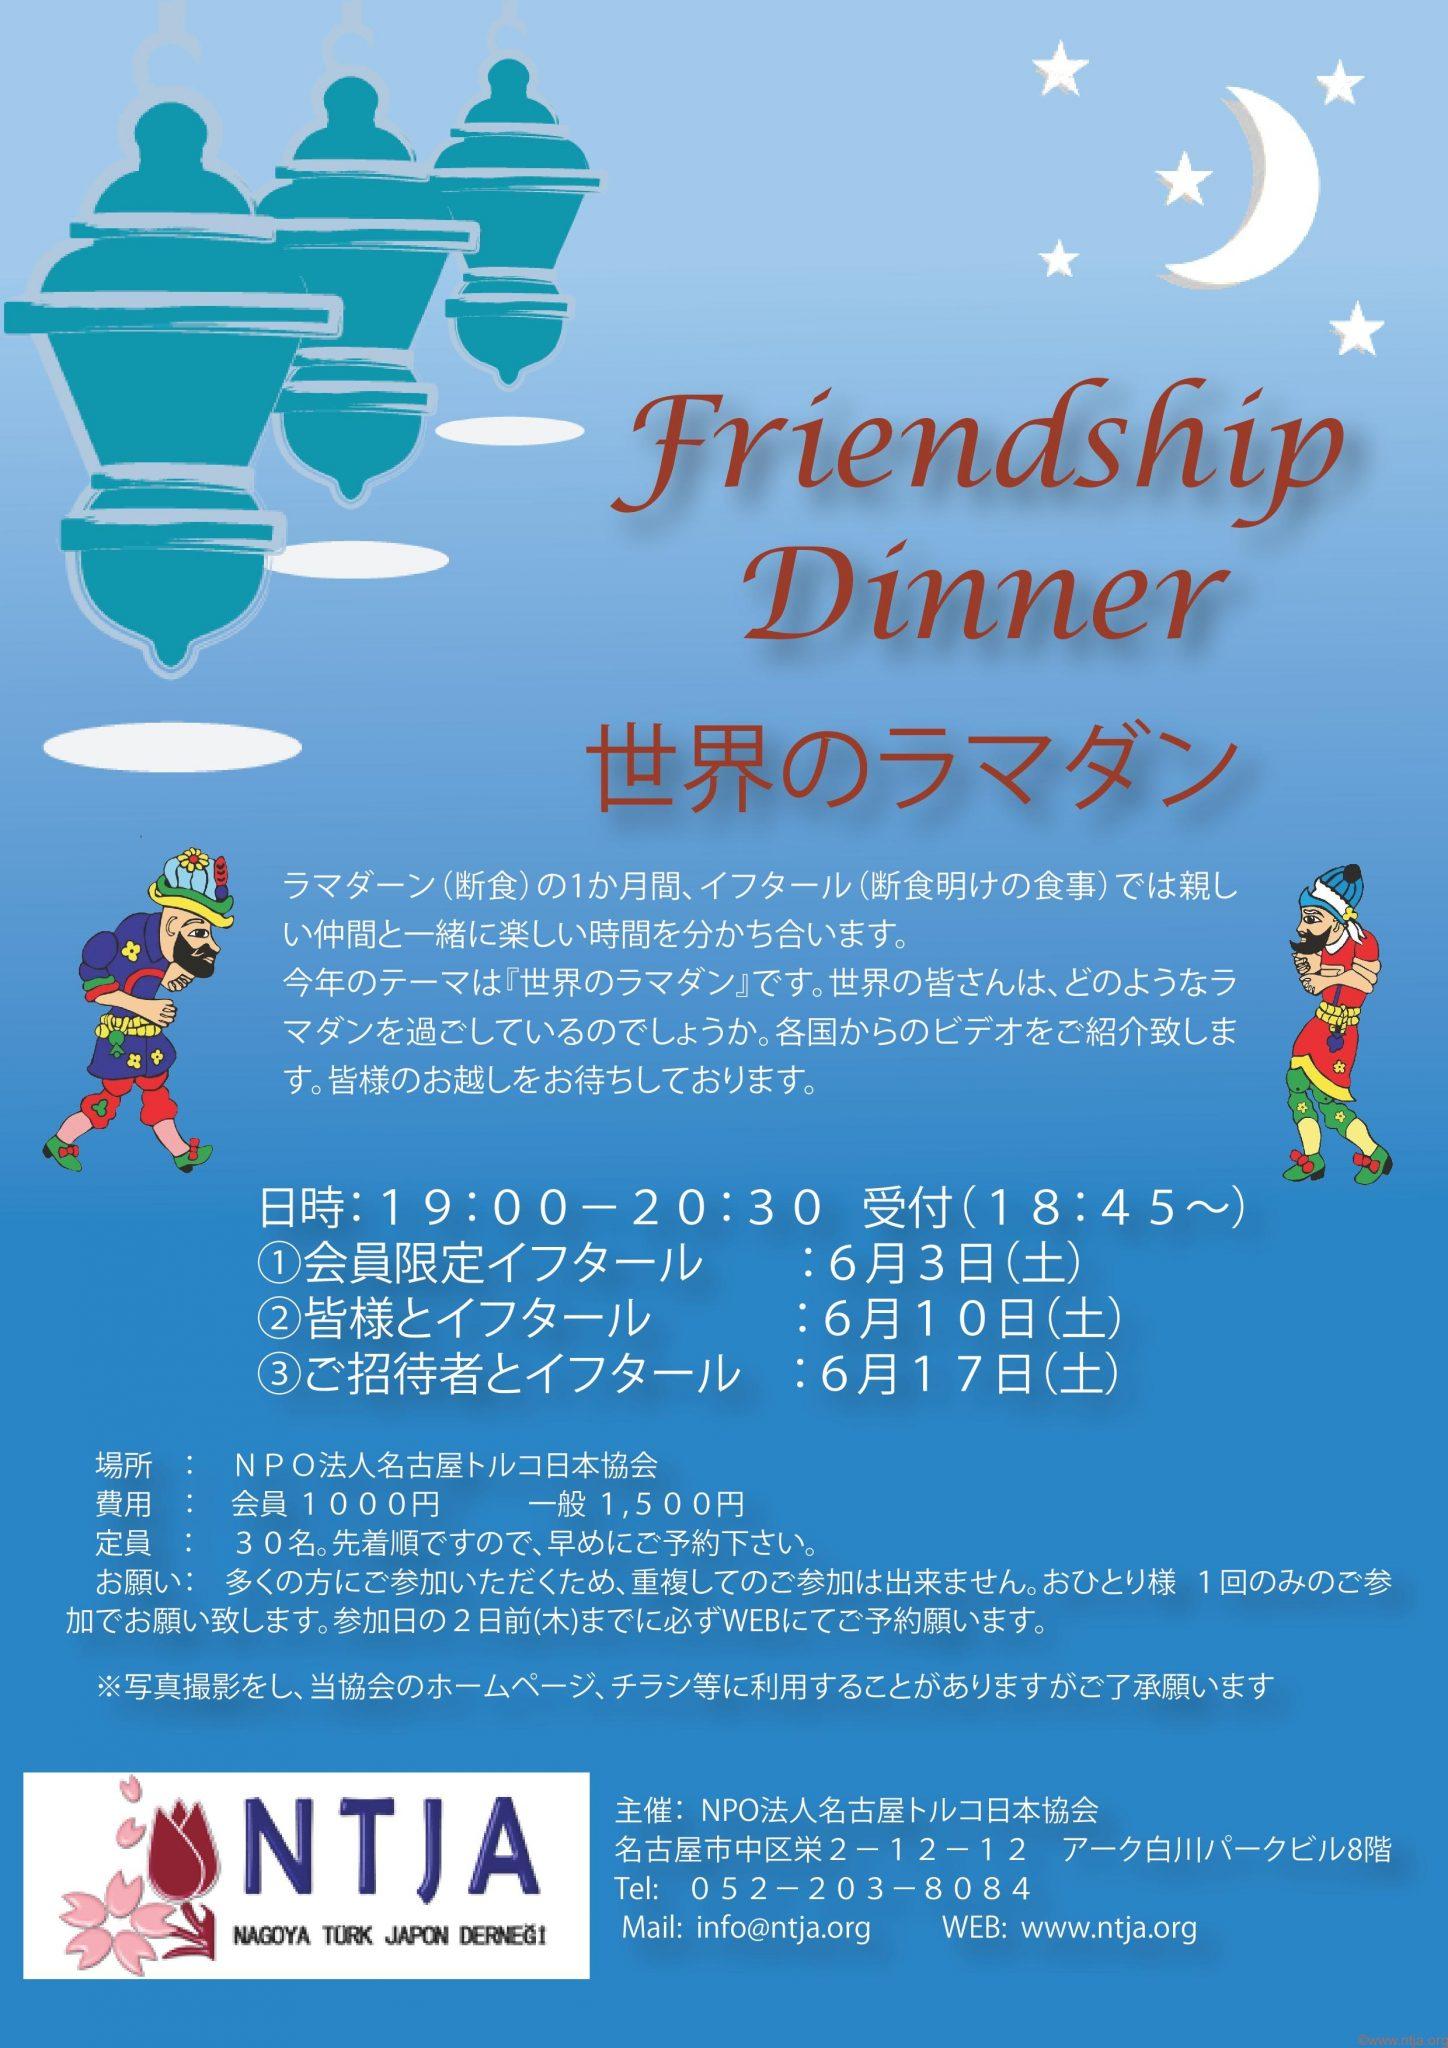 Friendship Dinner